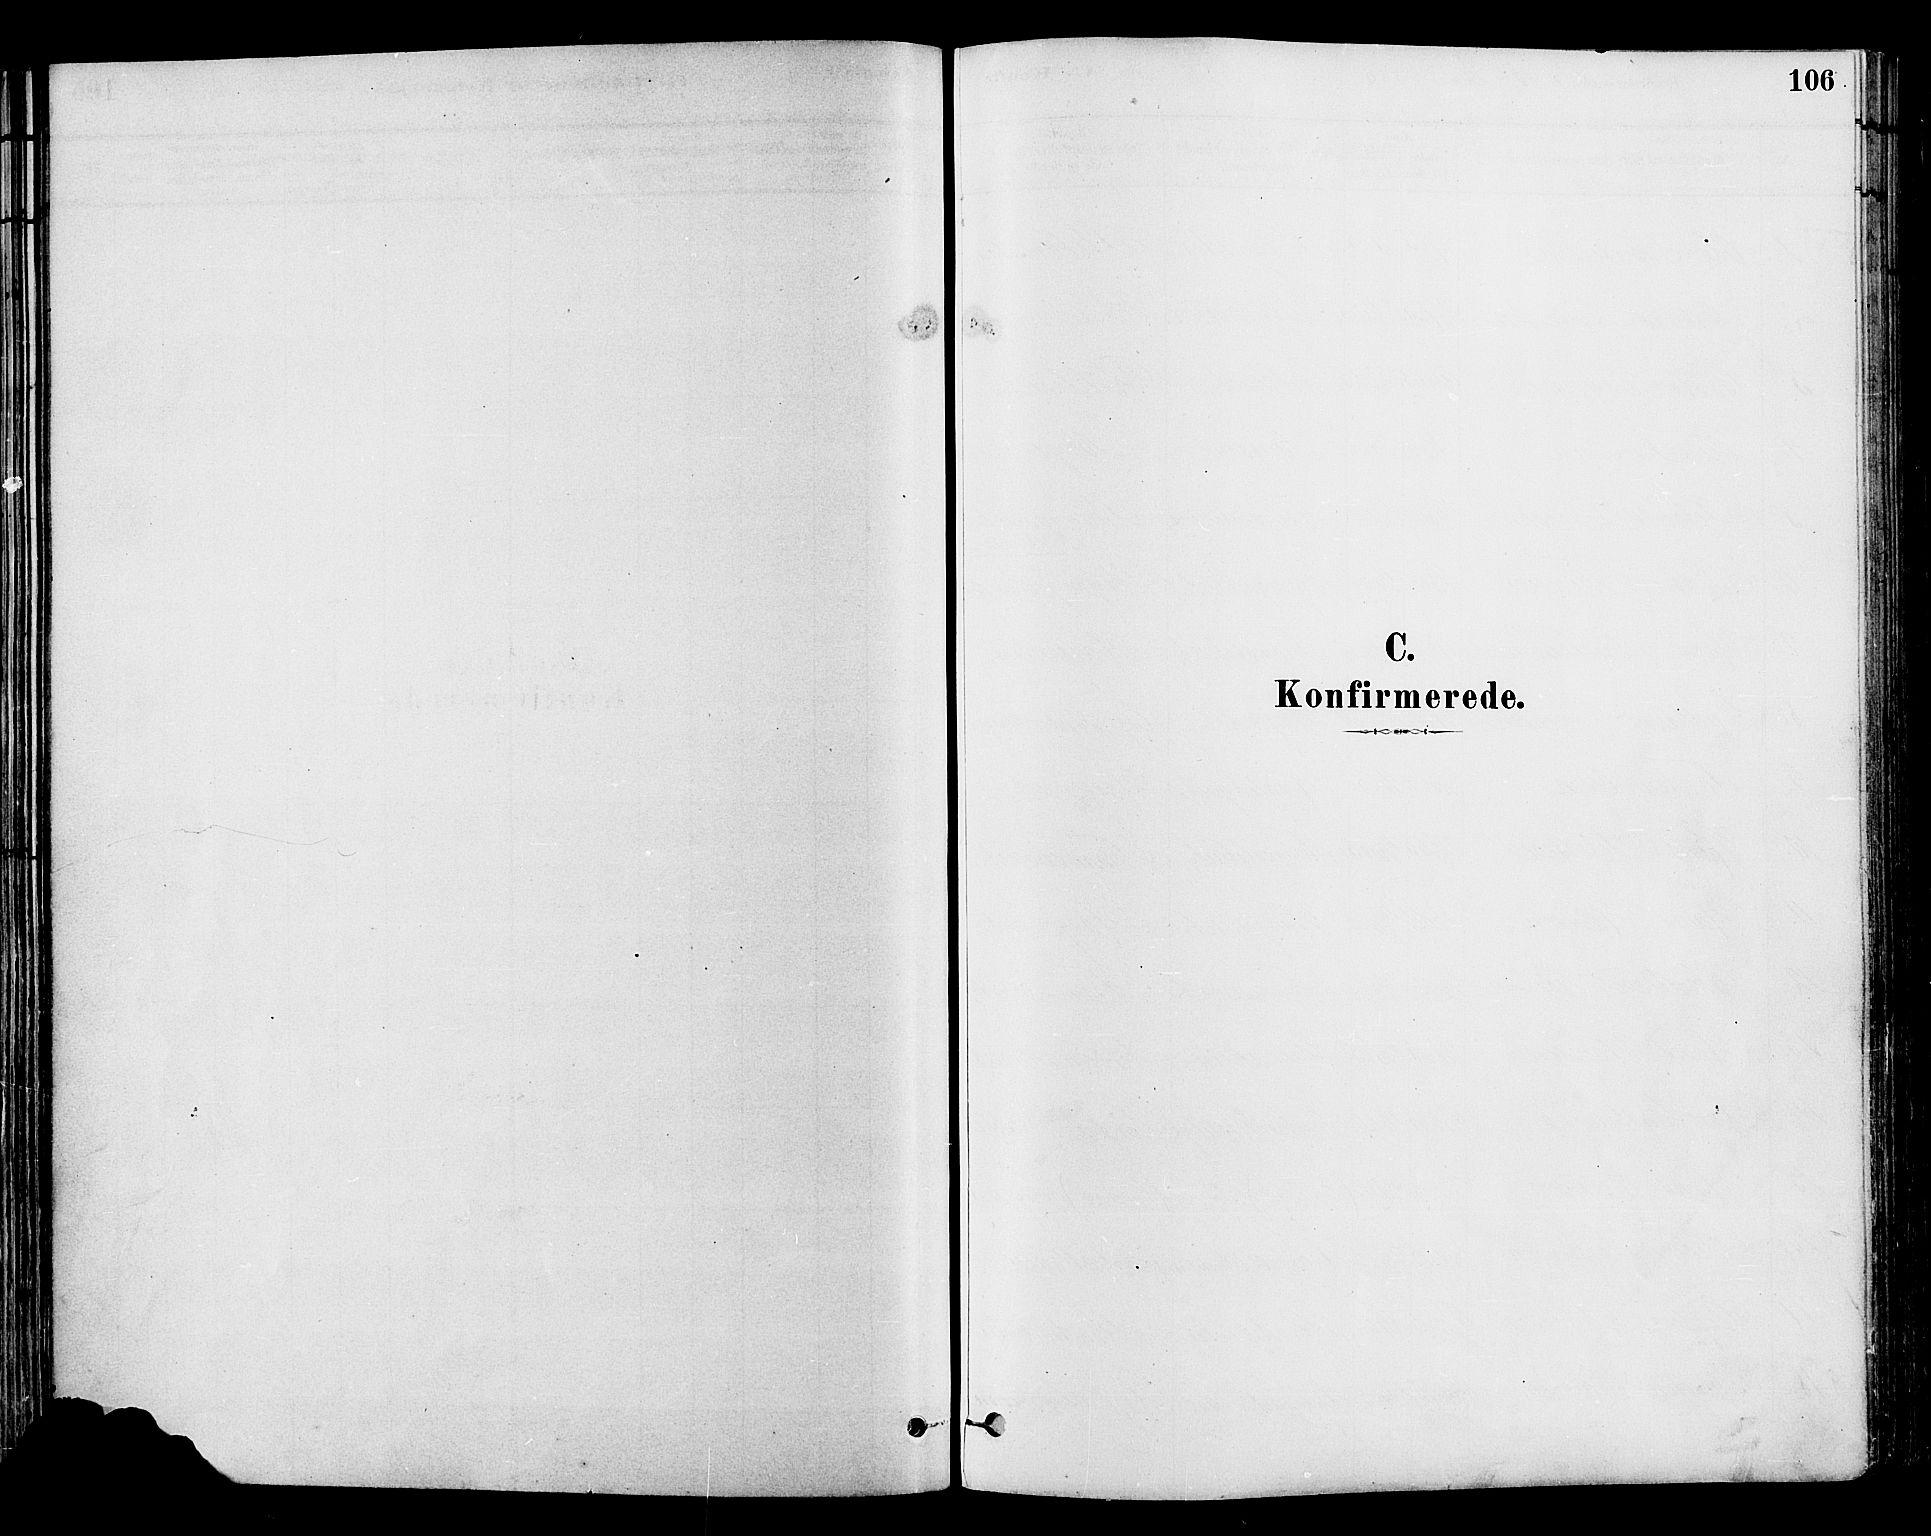 SAH, Gran prestekontor, Ministerialbok nr. 14, 1880-1889, s. 106